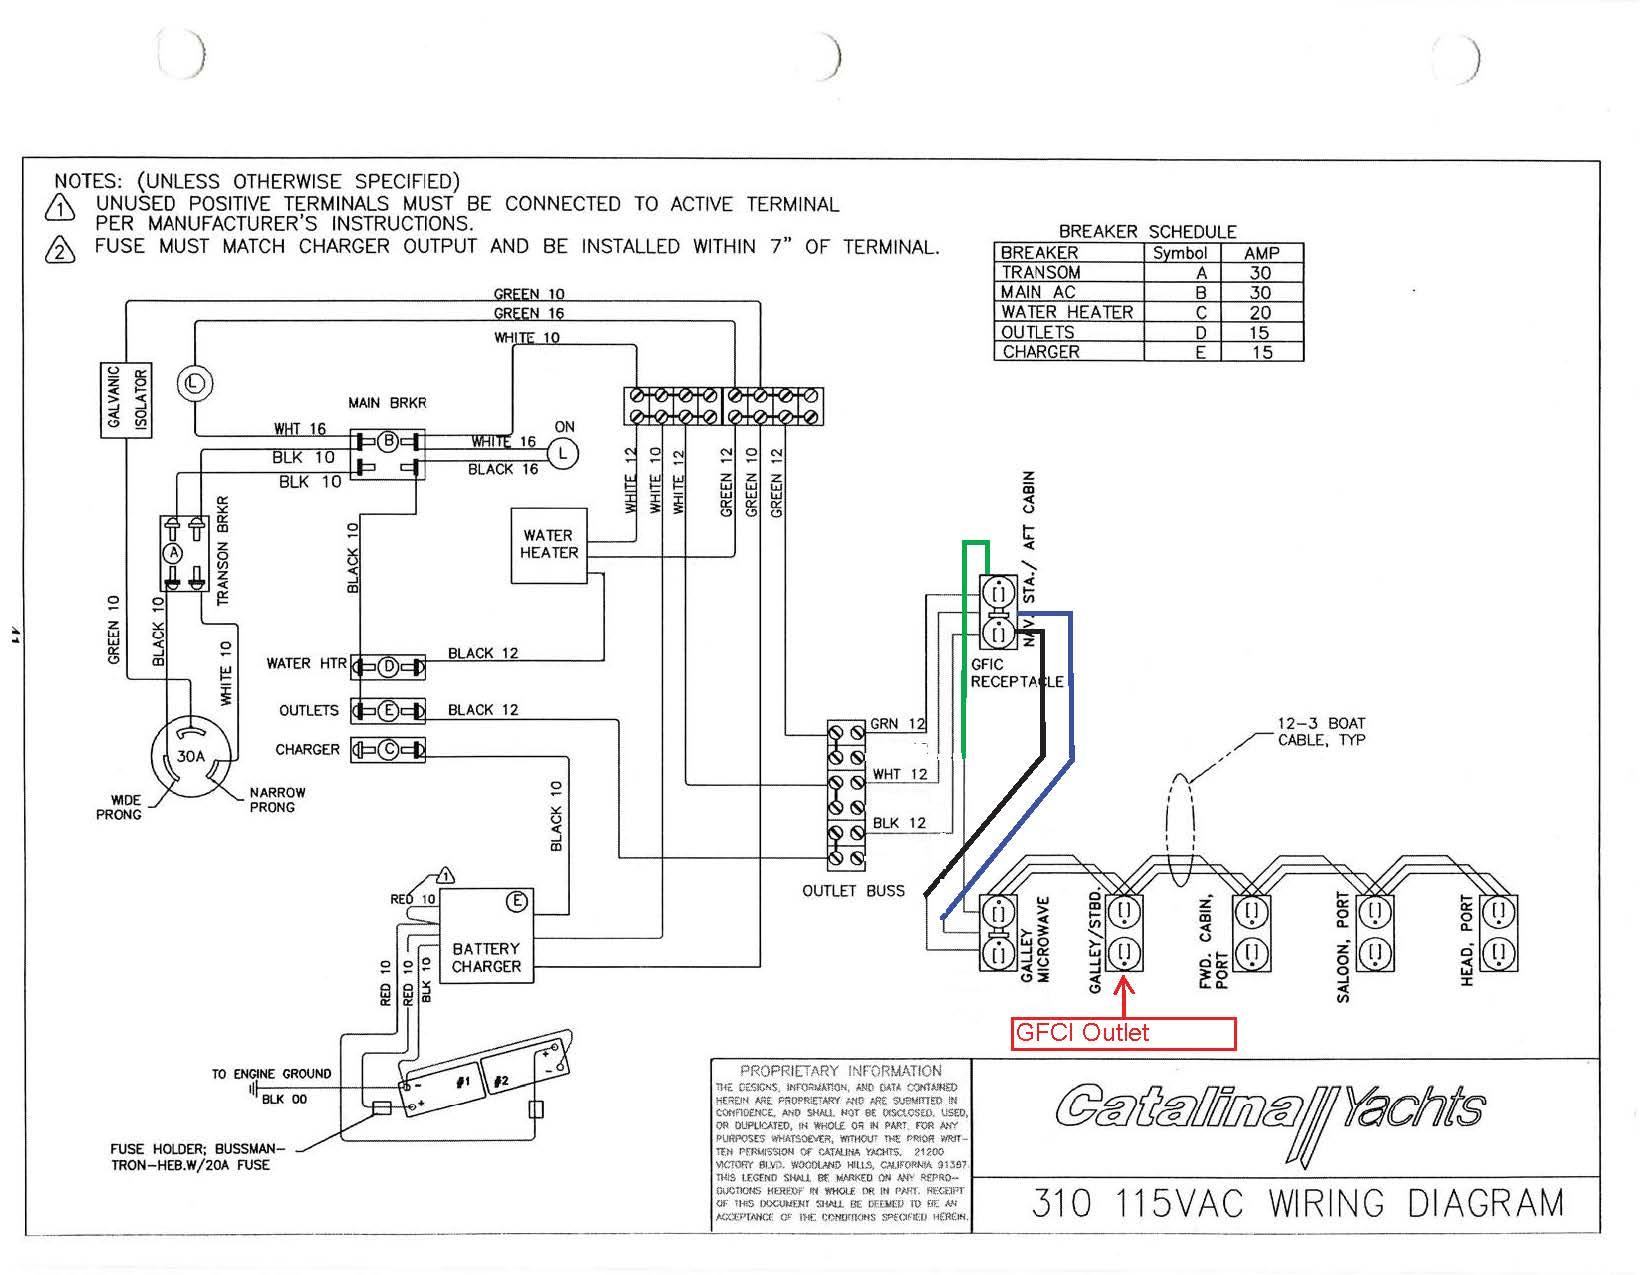 maxon liftgate switch wiring diagram wiring diagrams honda motorcycle wiring diagrams cb radio microphone wiring diagram [ 1650 x 1275 Pixel ]